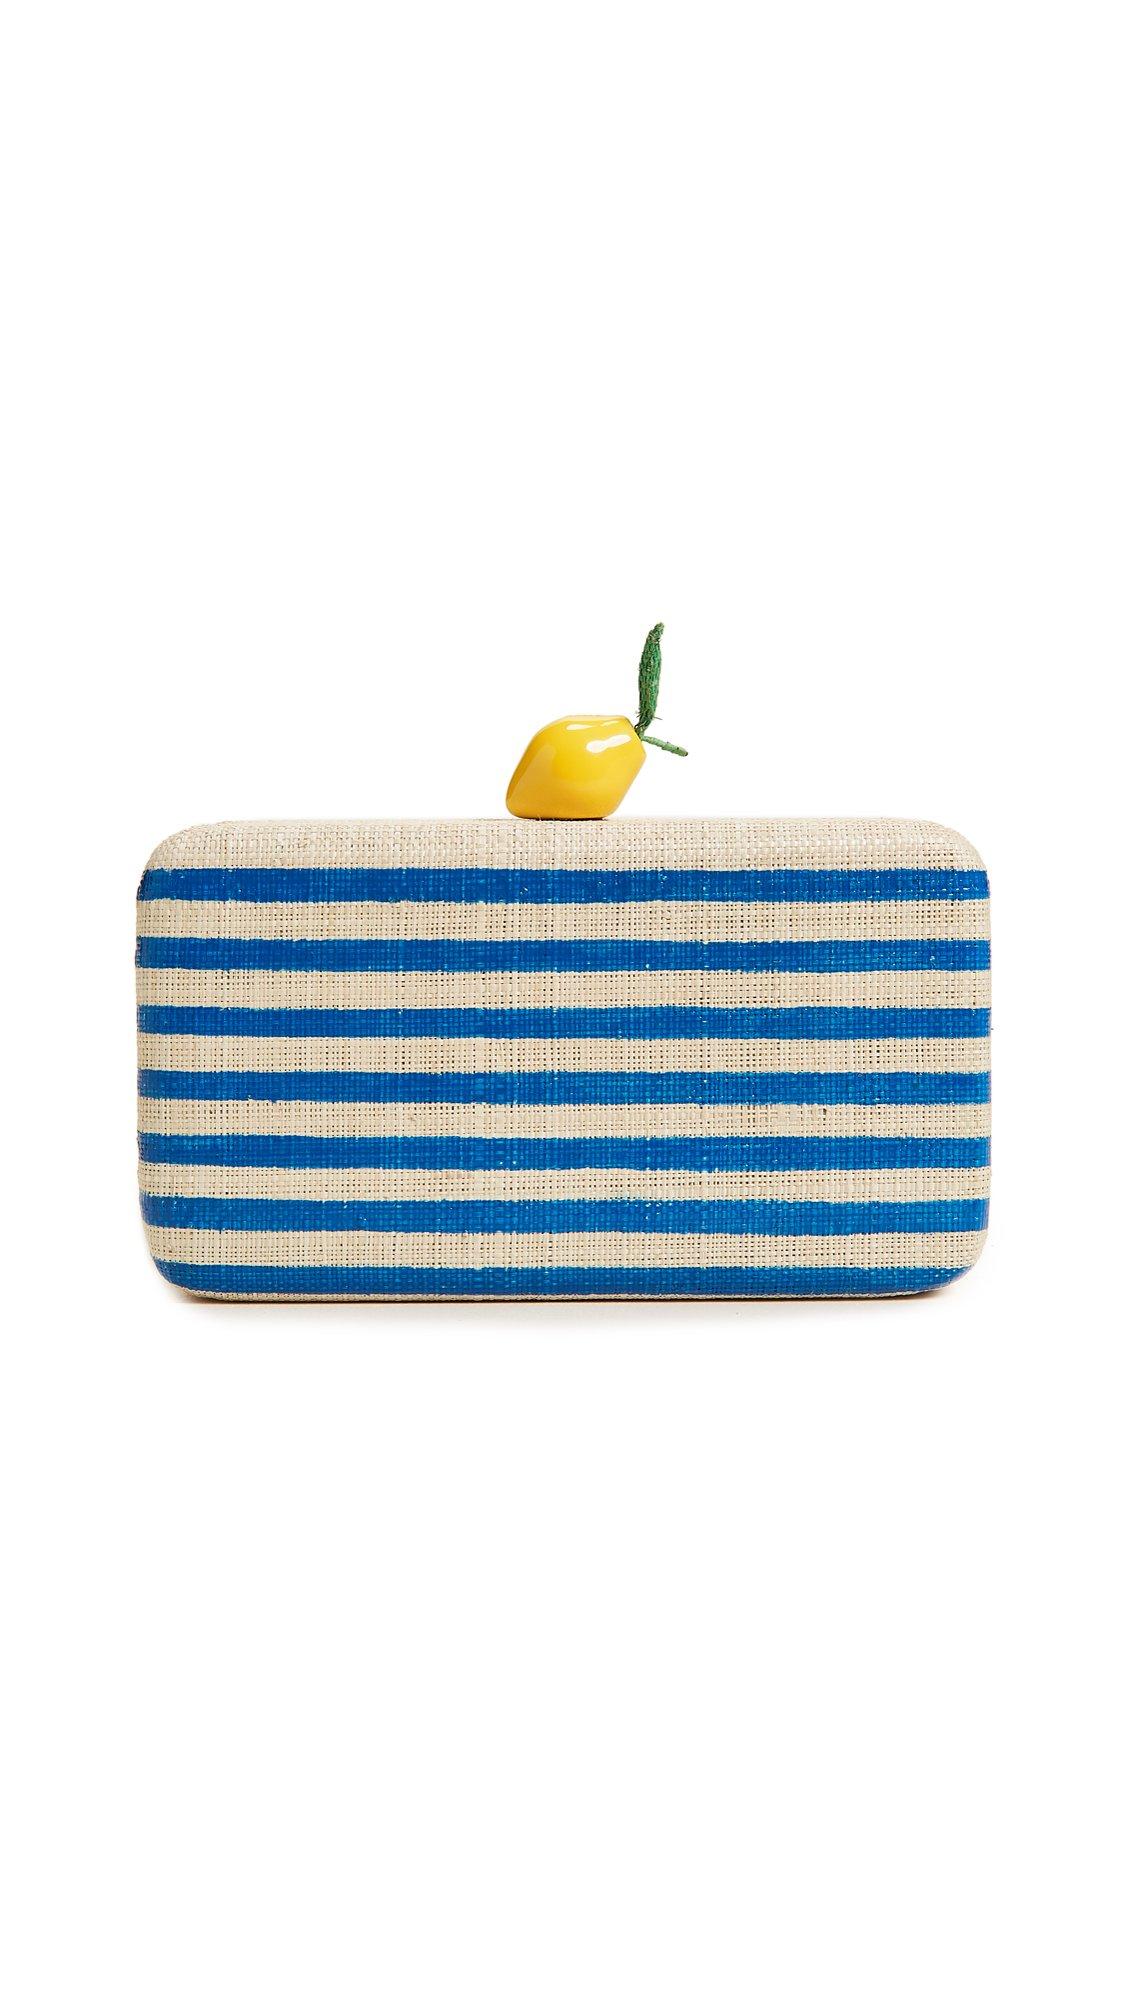 Kayu Women's Vera Lemon Clutch, Blue Stripe, One Size